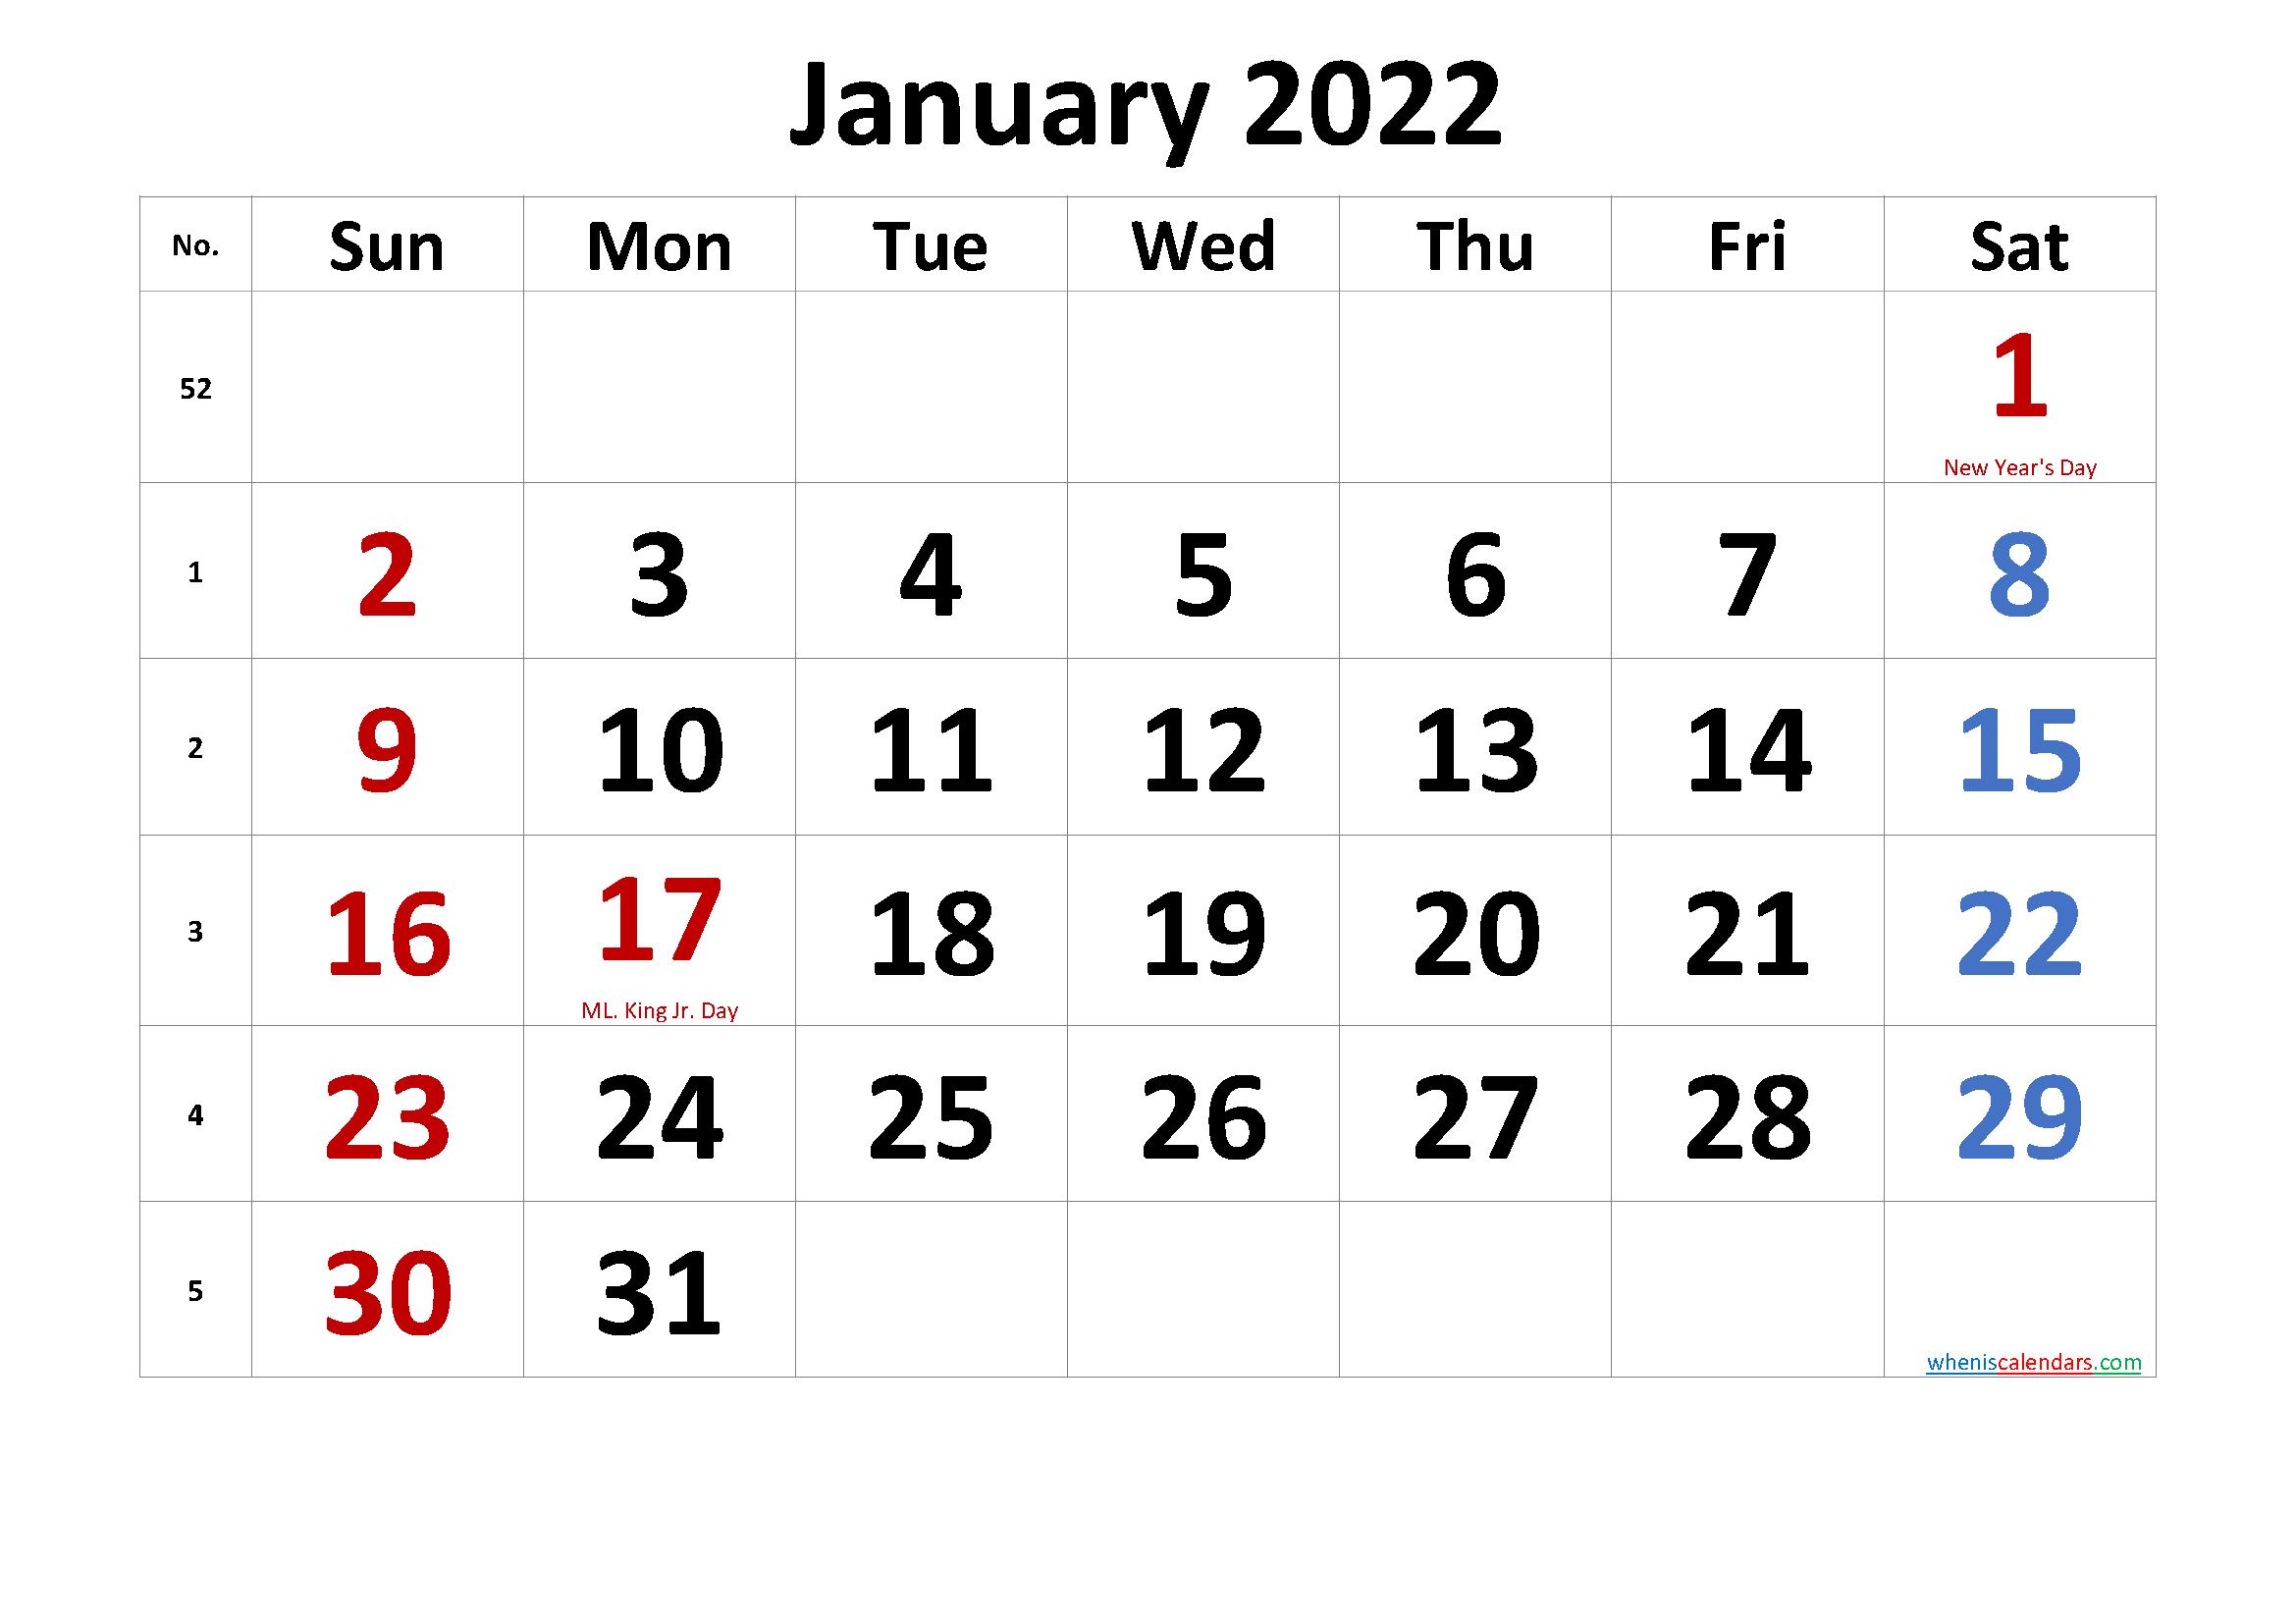 Printable January 2022 Calendar With Holidays - 6 Throughout Free Printable Calendar January 2022 With Holidays